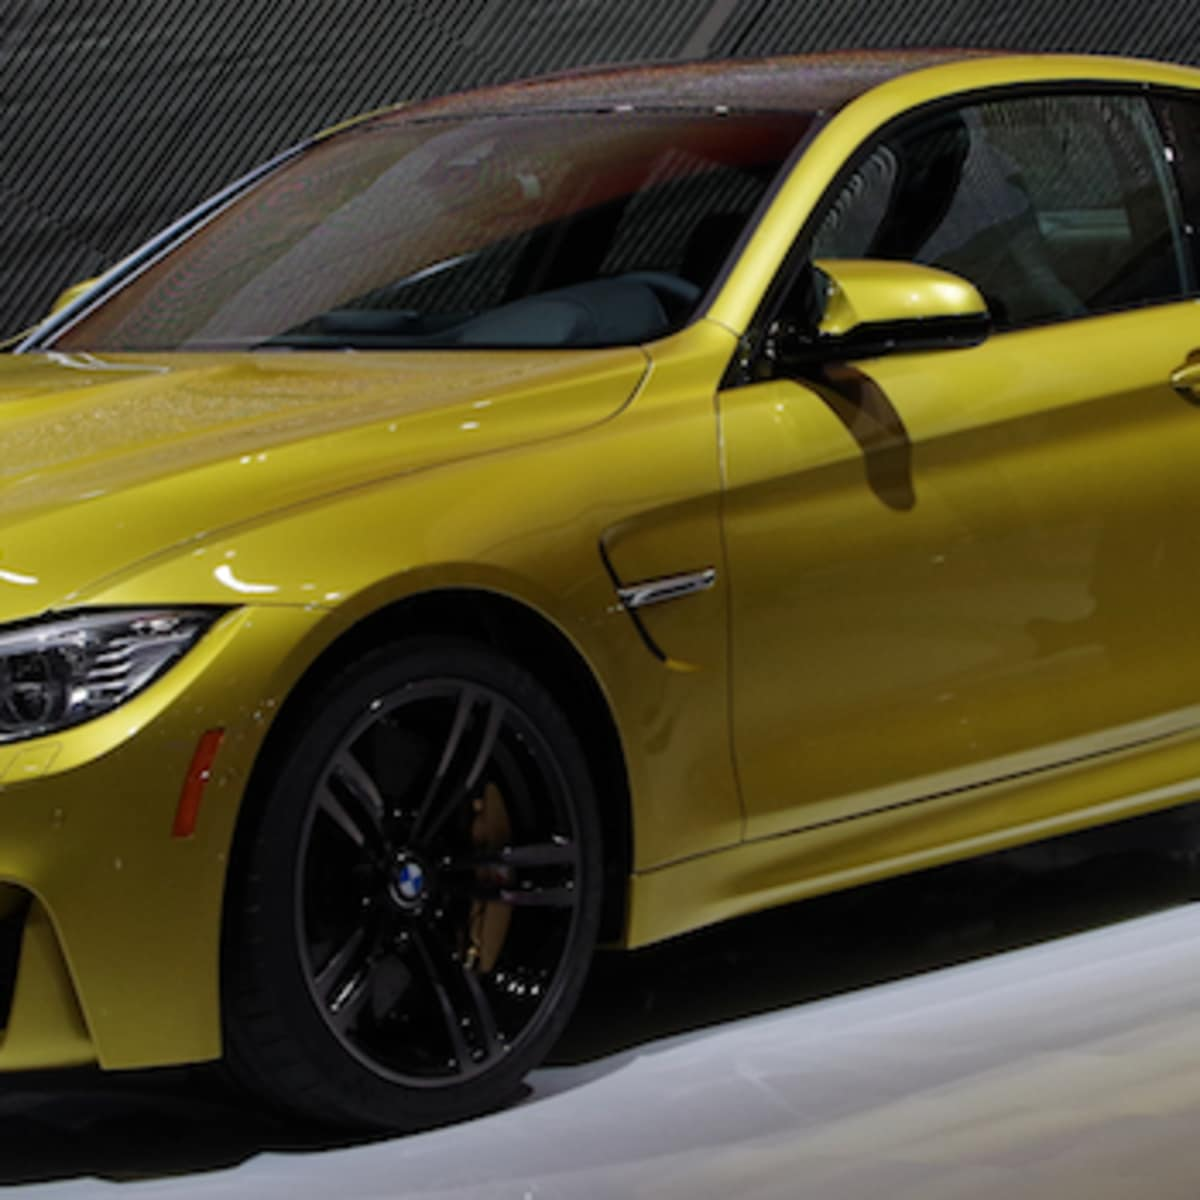 Bmw Brings 2014 M3 M4 2 Series To Detroit Reviewed Cars